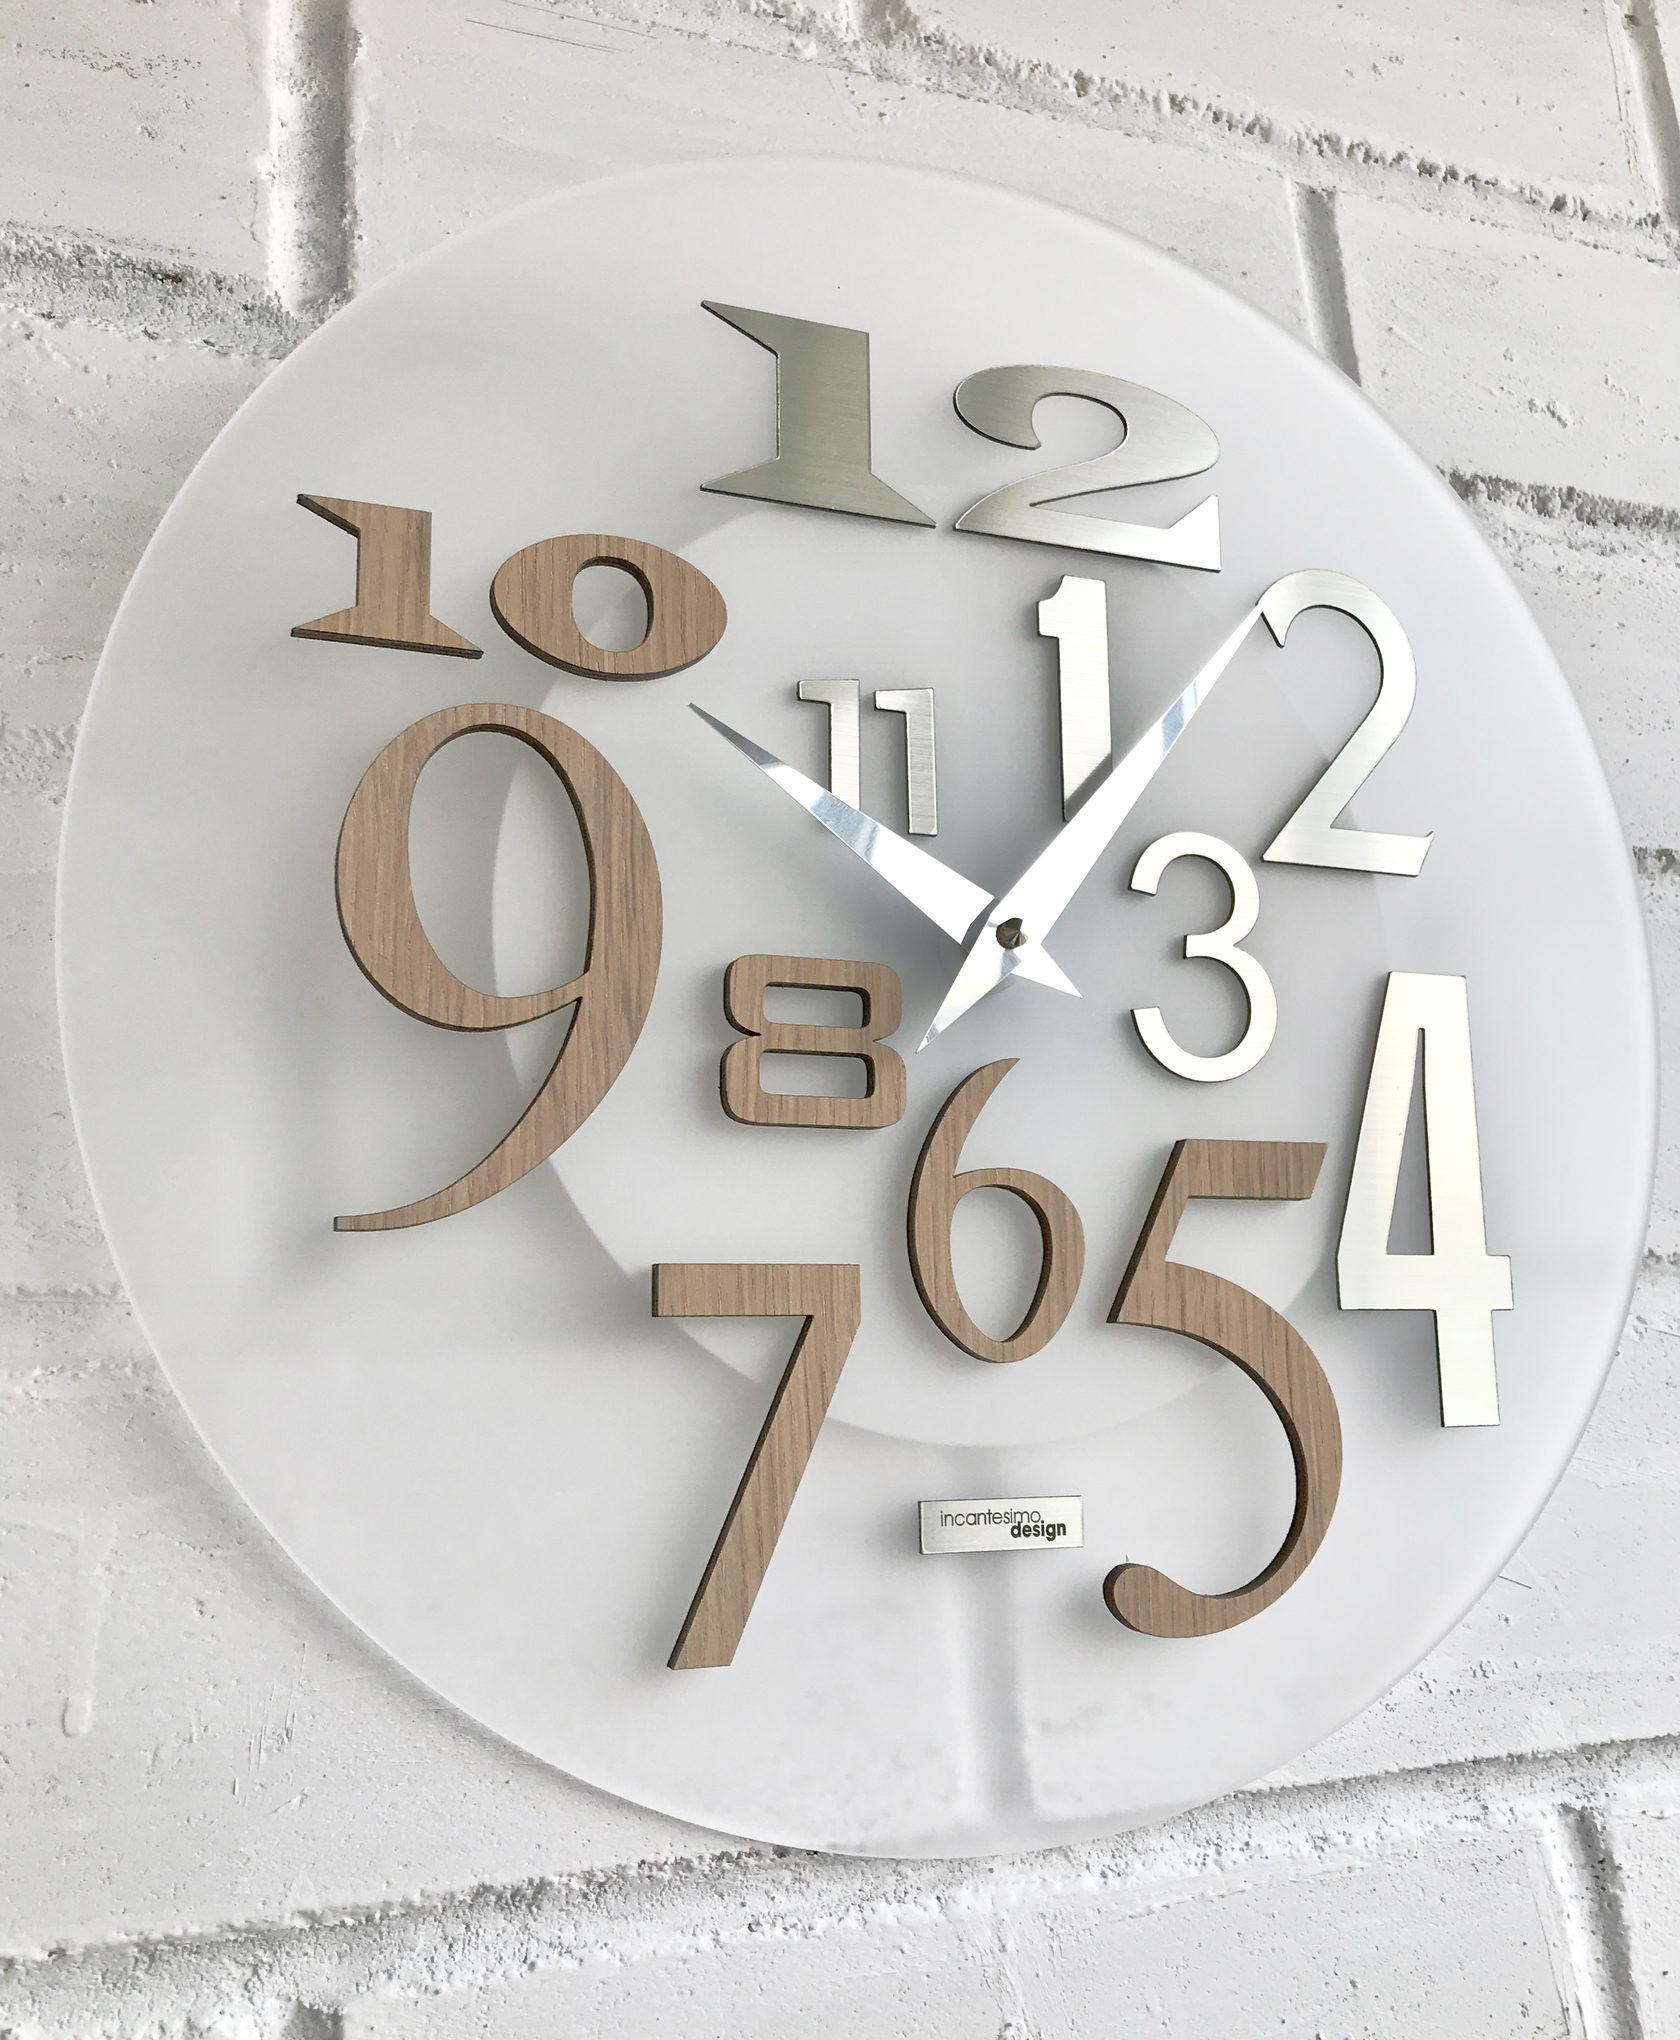 Настенные часы Incantesimo Design 036 S